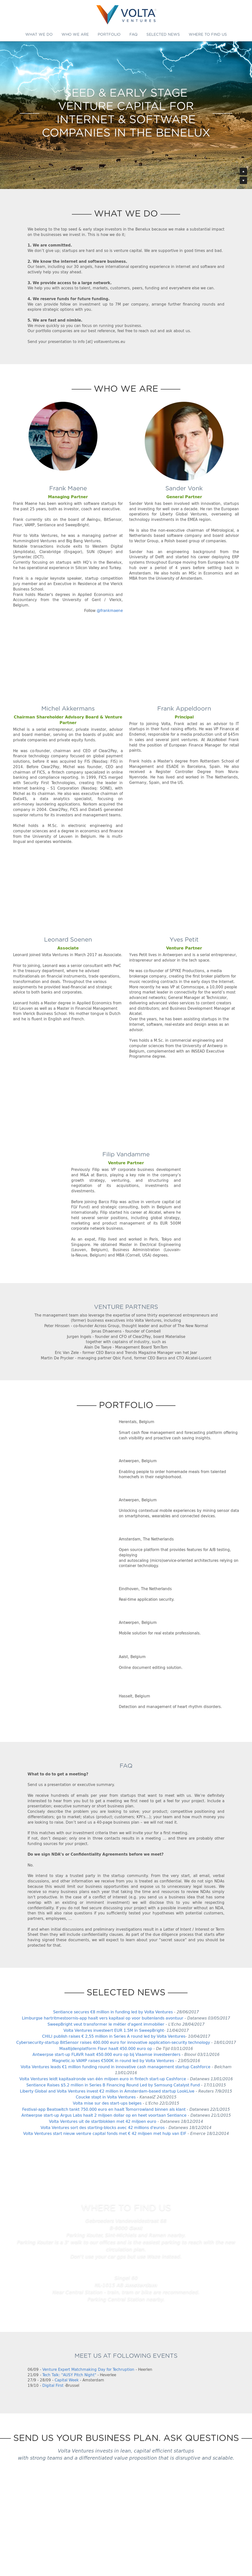 venture capital matchmaking